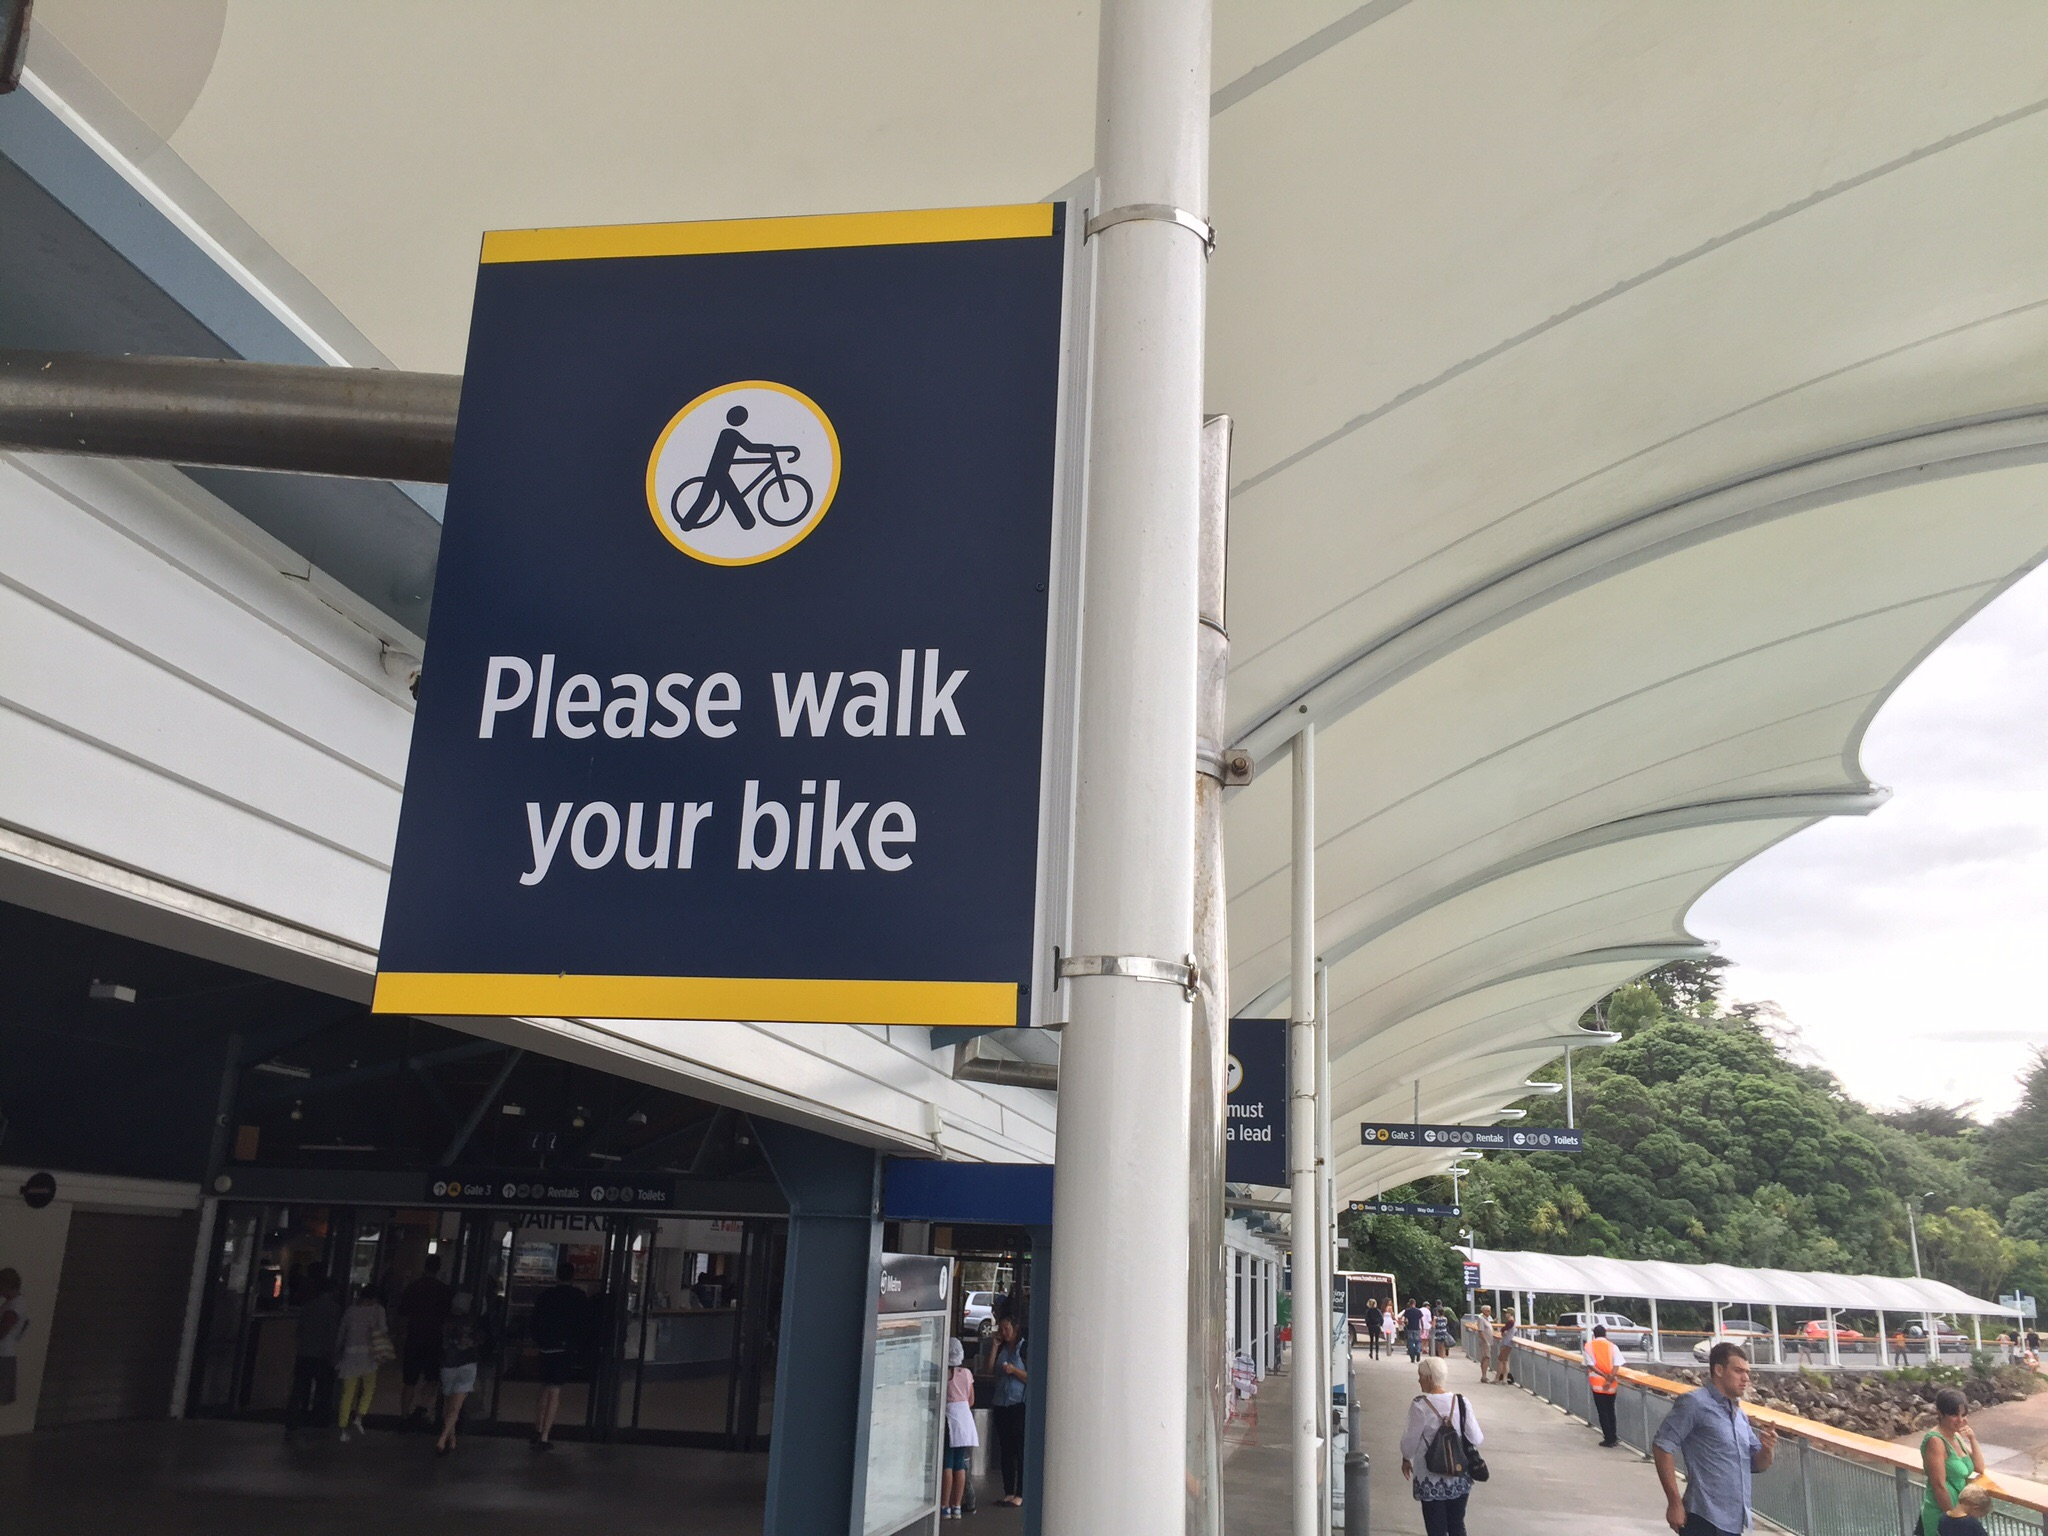 I've heard of dog walking, cat walking, even goat walking but bike walking???